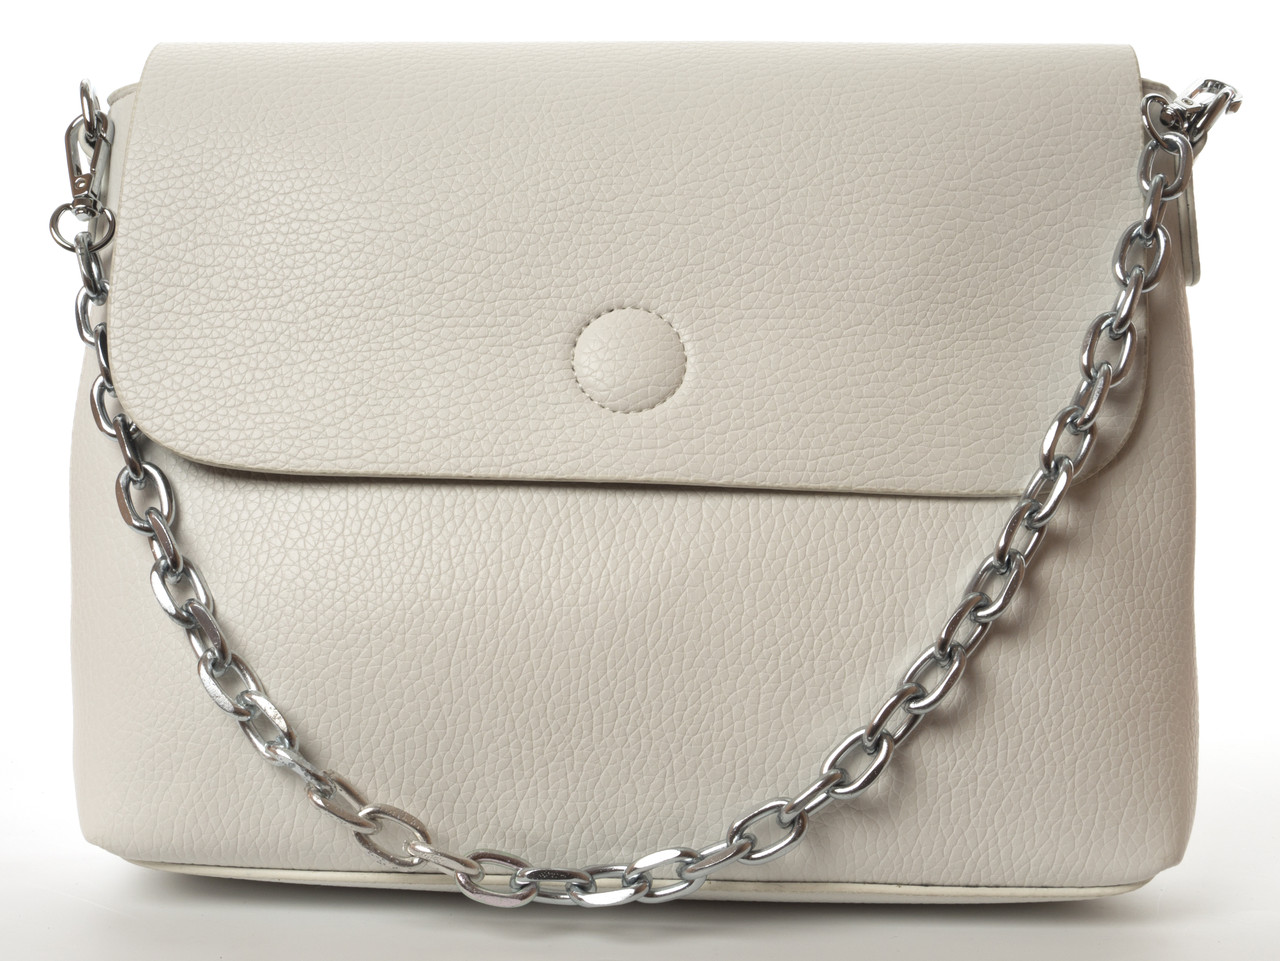 Акуратна міцна жіноча сумочка з дуже якісного замінника WEILIYA art. F1924